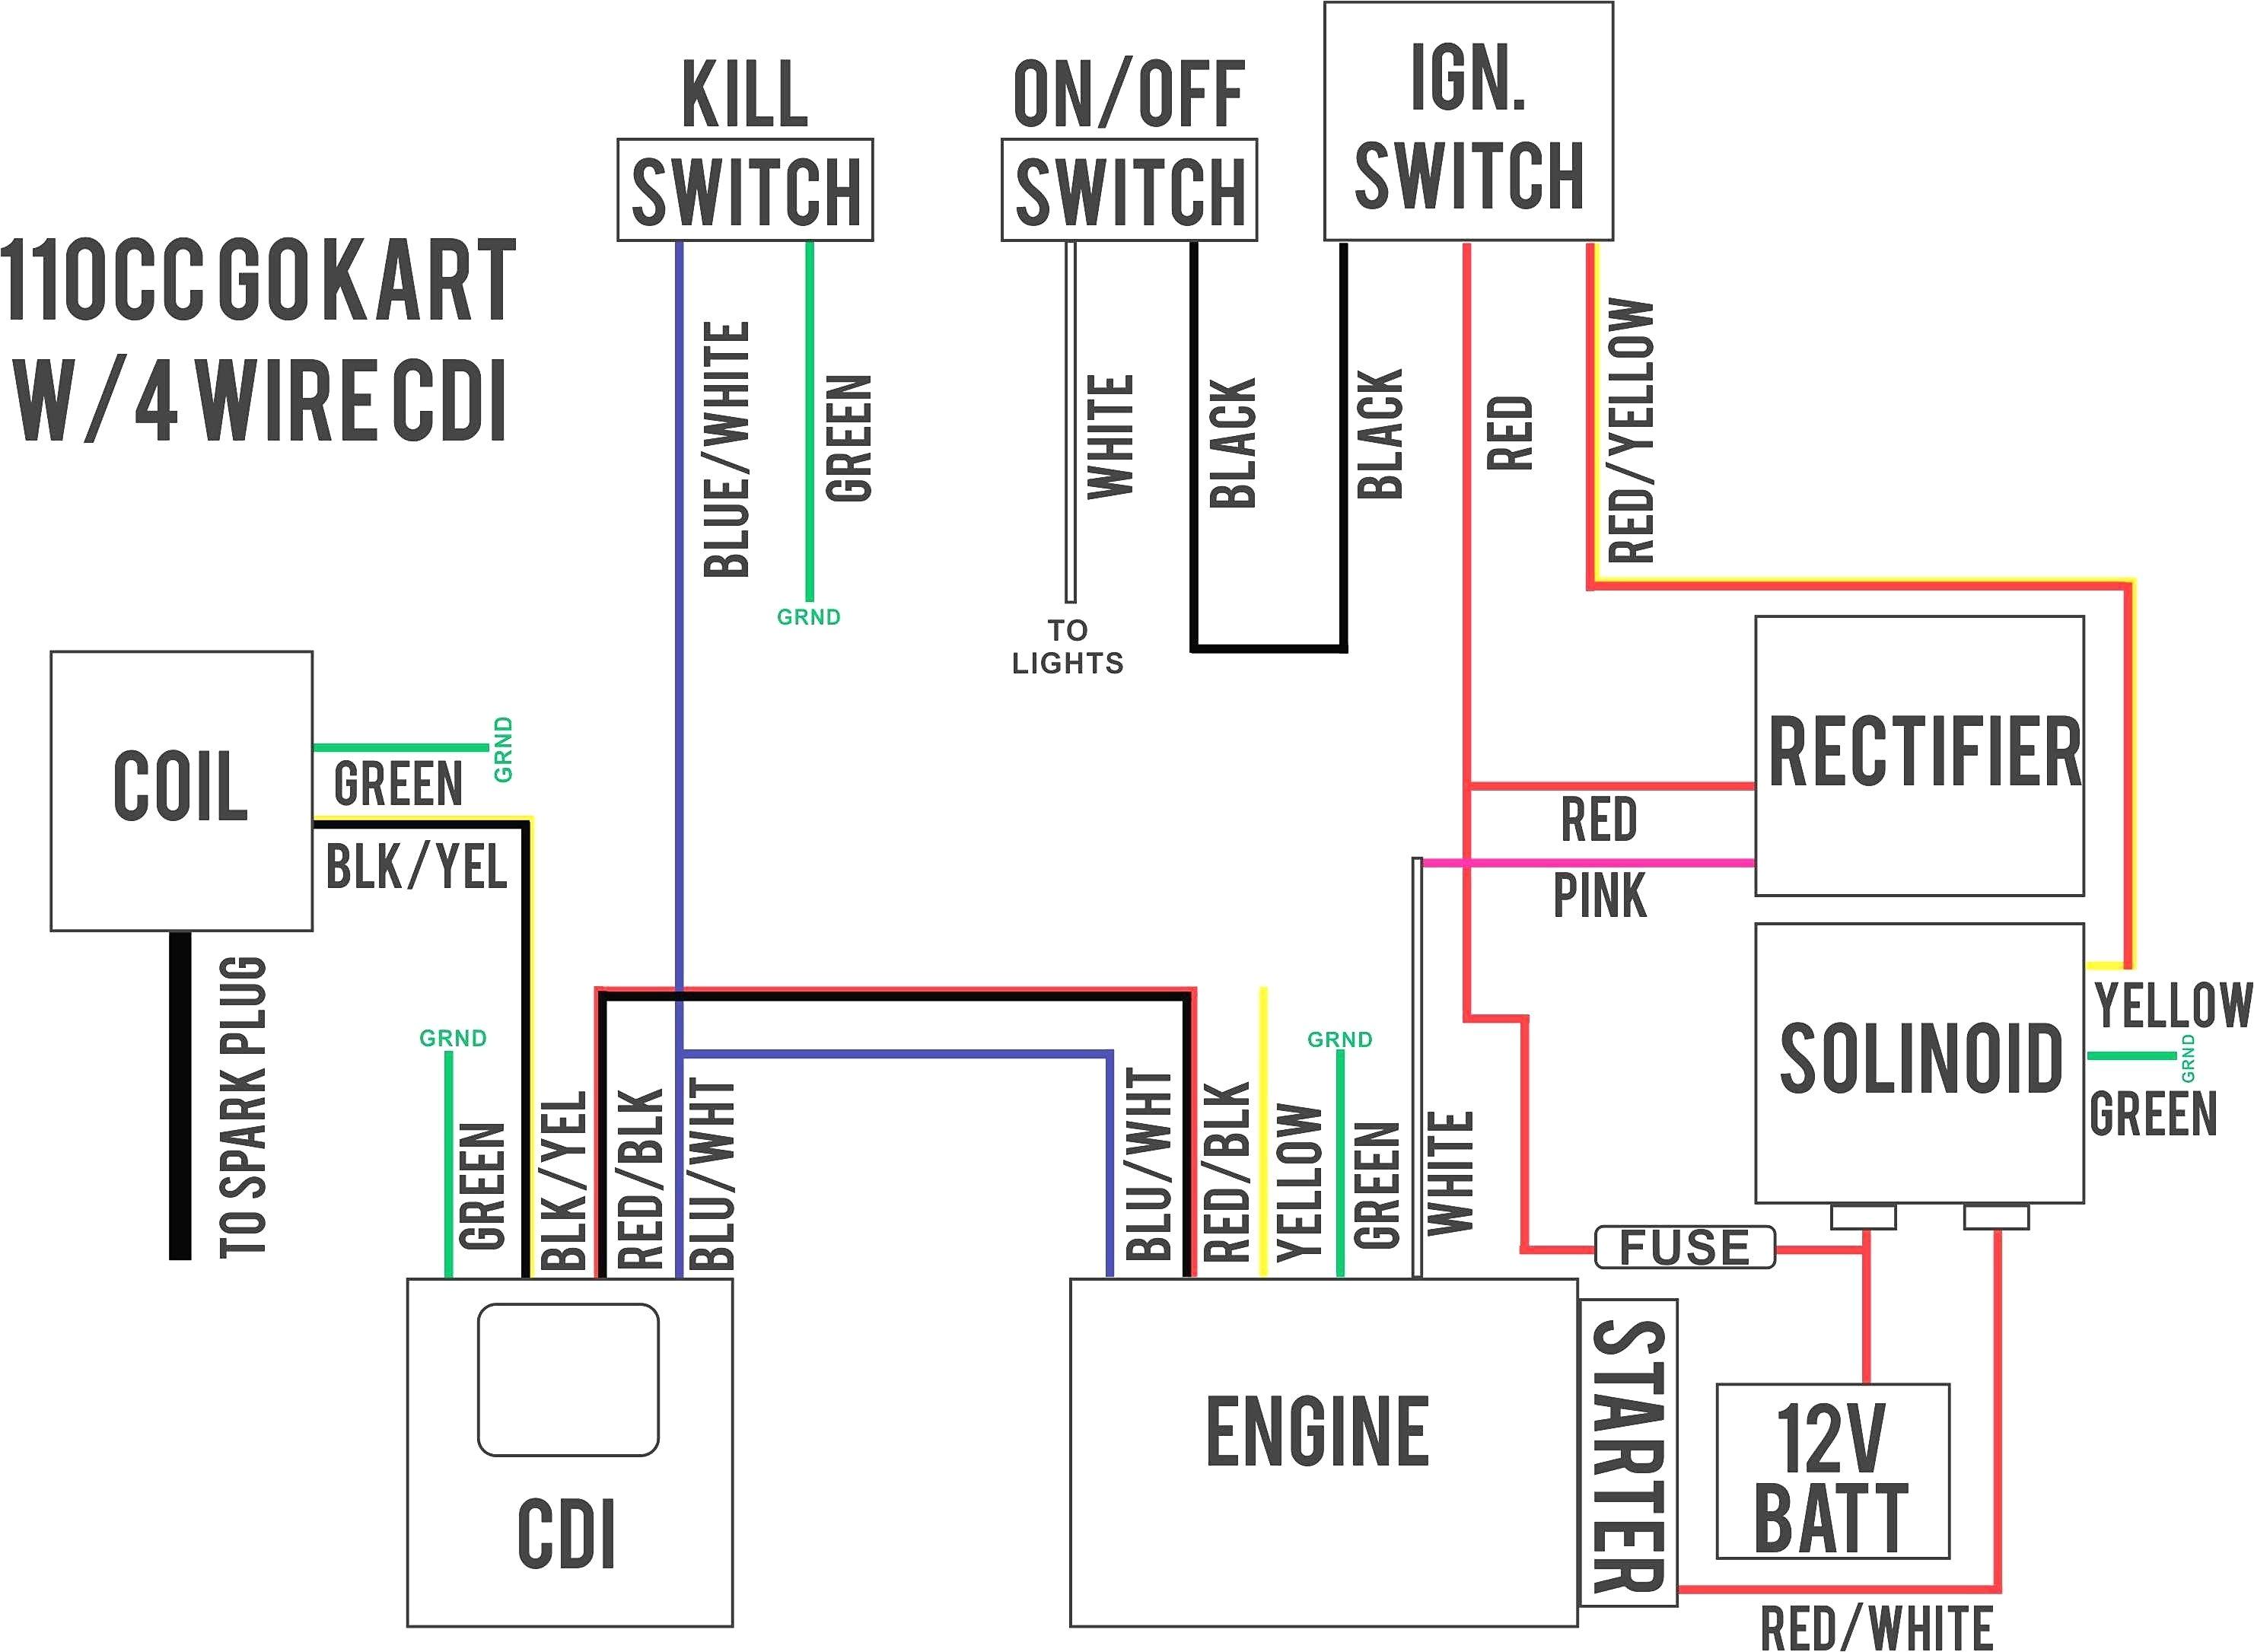 Lifan Wiring Diagram Electrical Wiring Diagram Of Motorcycle Wiring Diagram Diagram